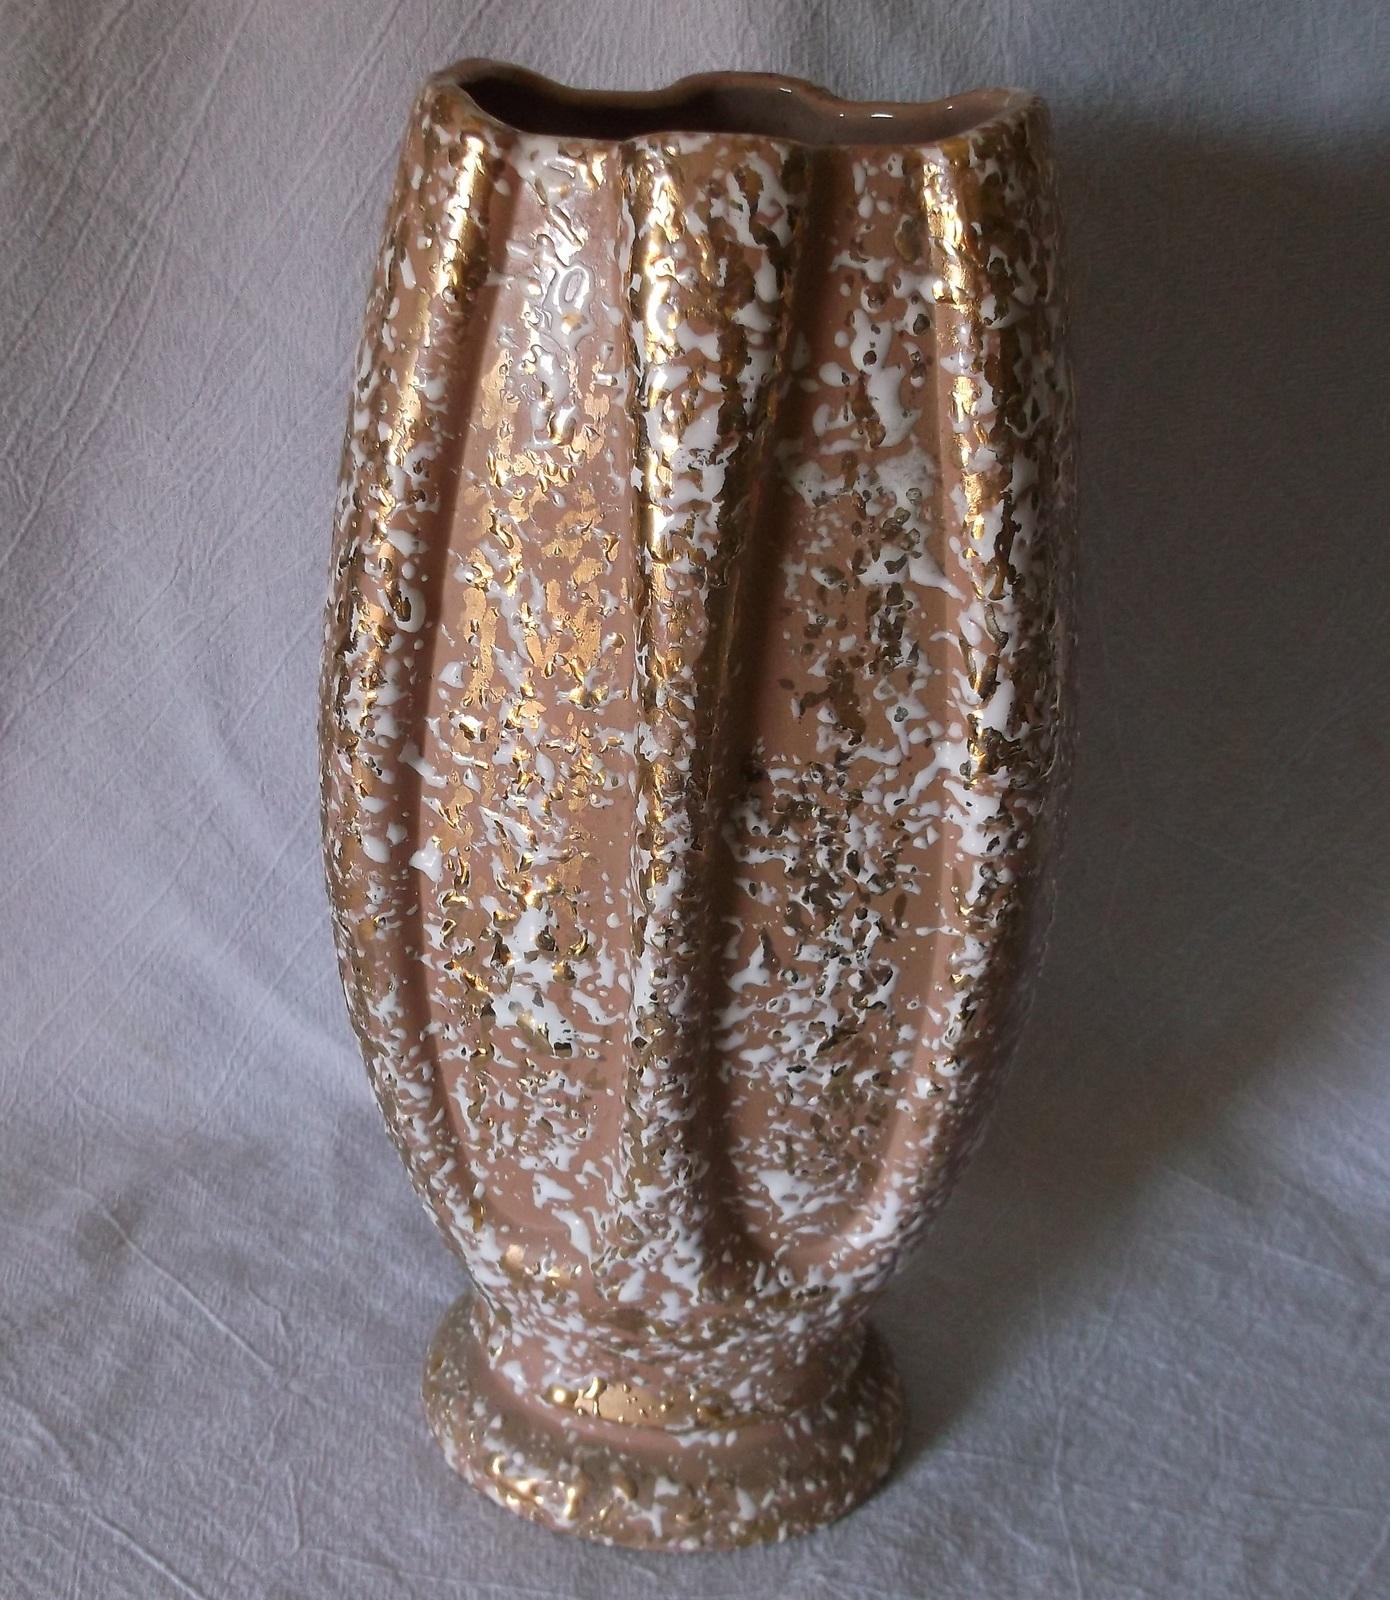 savoy china deena vase white enamel splatter weeping gold mid century large other american pottery. Black Bedroom Furniture Sets. Home Design Ideas